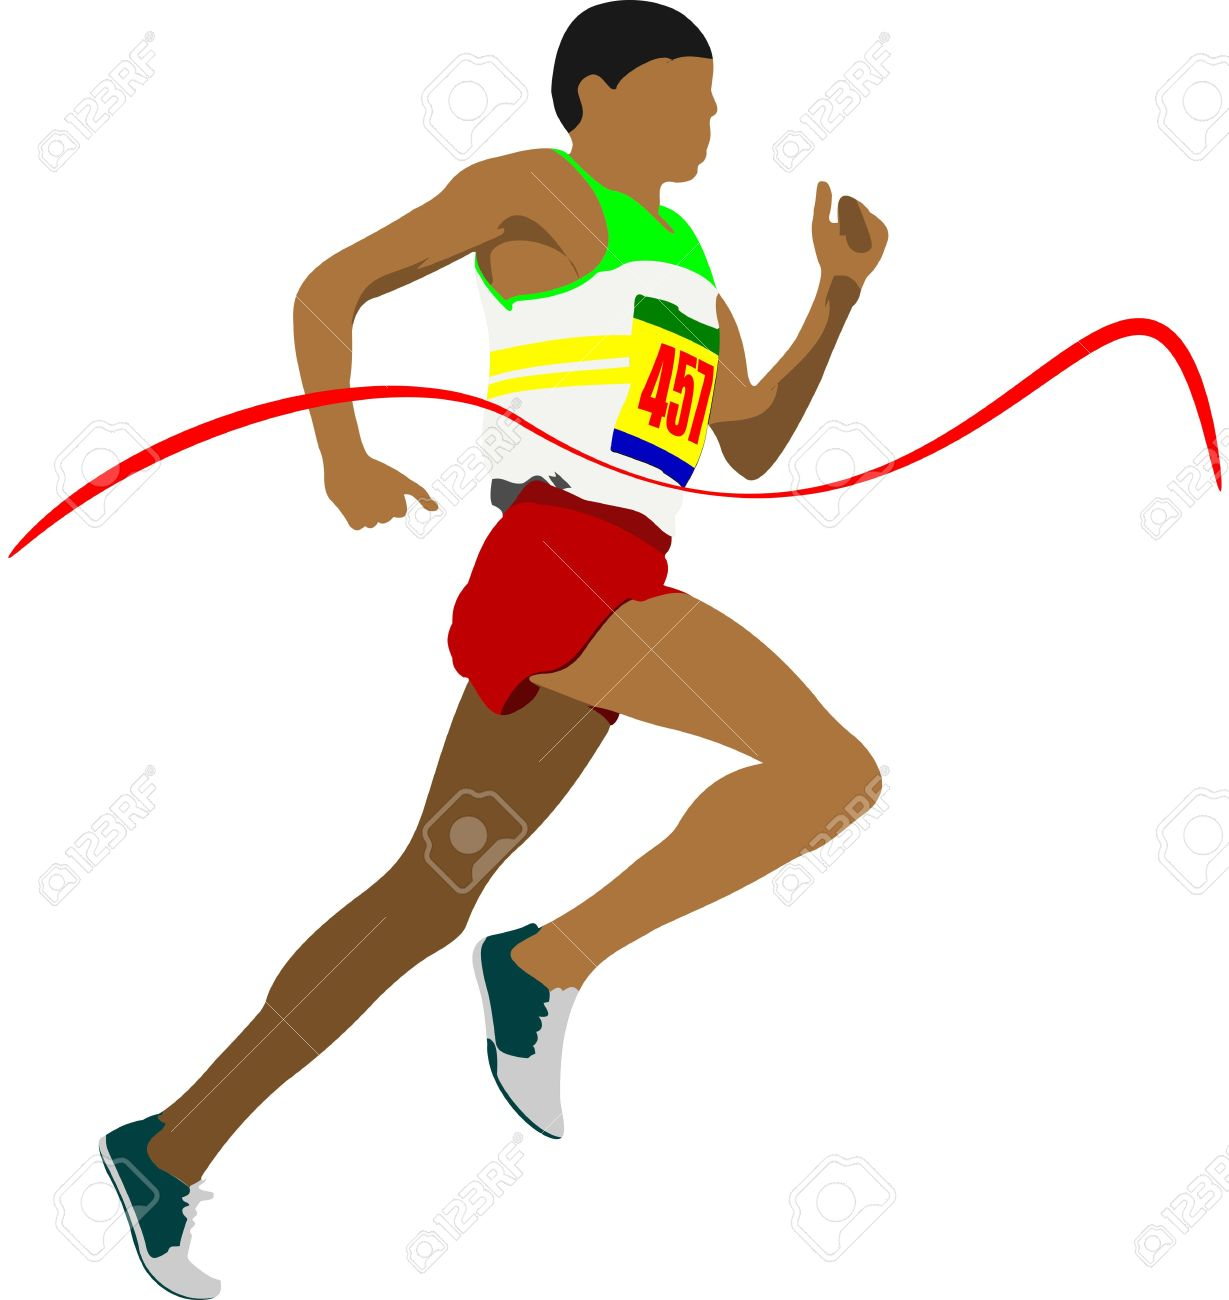 Athlete clipart athelete.  athletic clip art